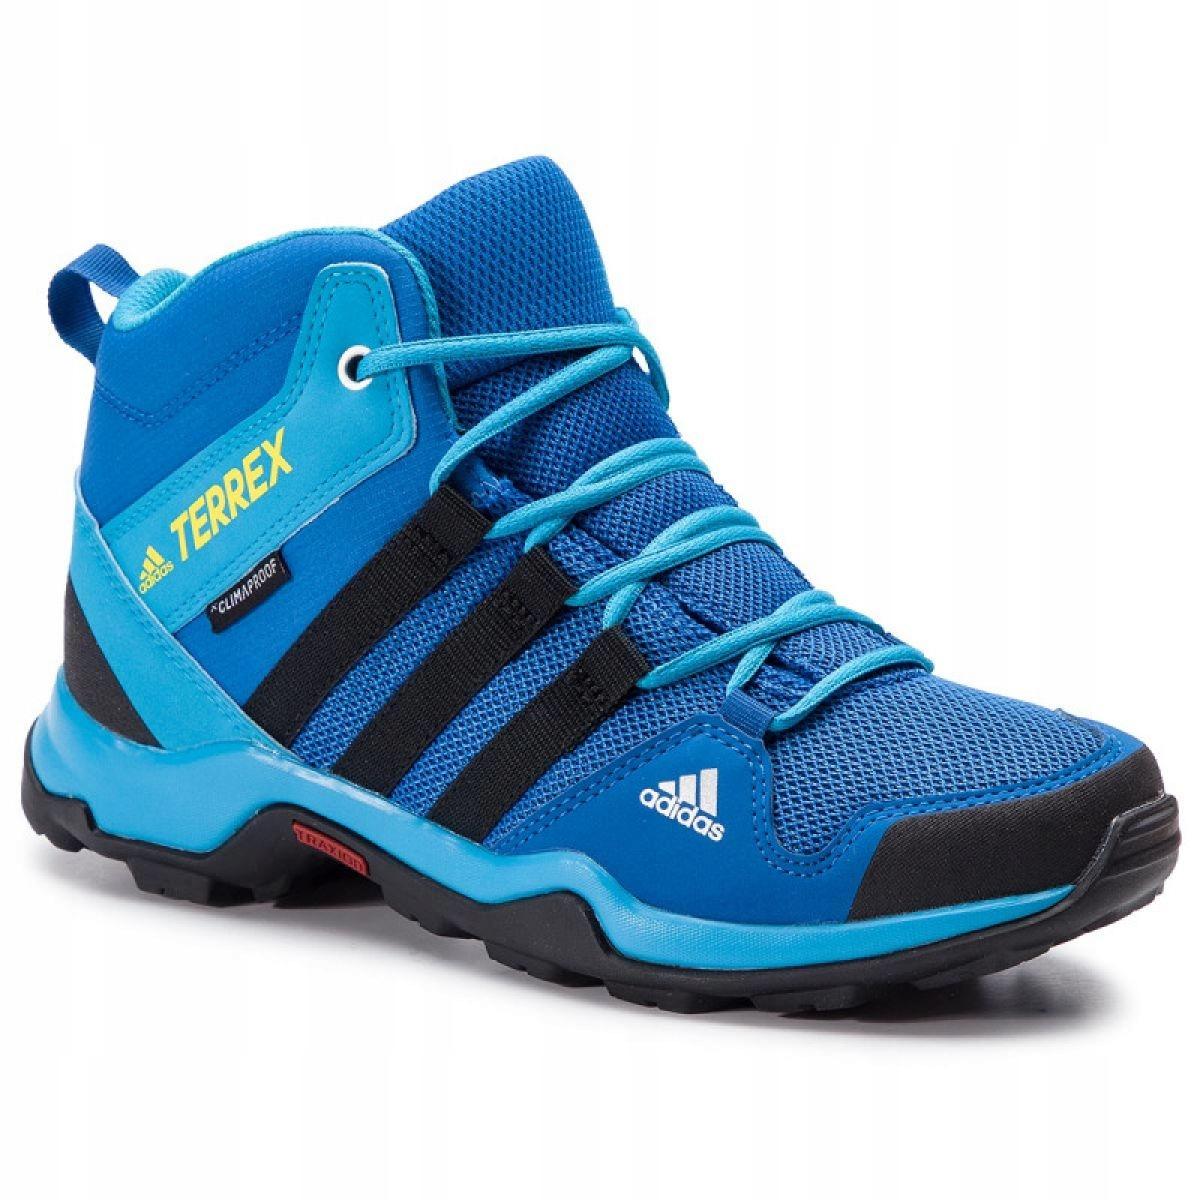 Buty trekkingowe adidas Terrex AX2R BC0673 35